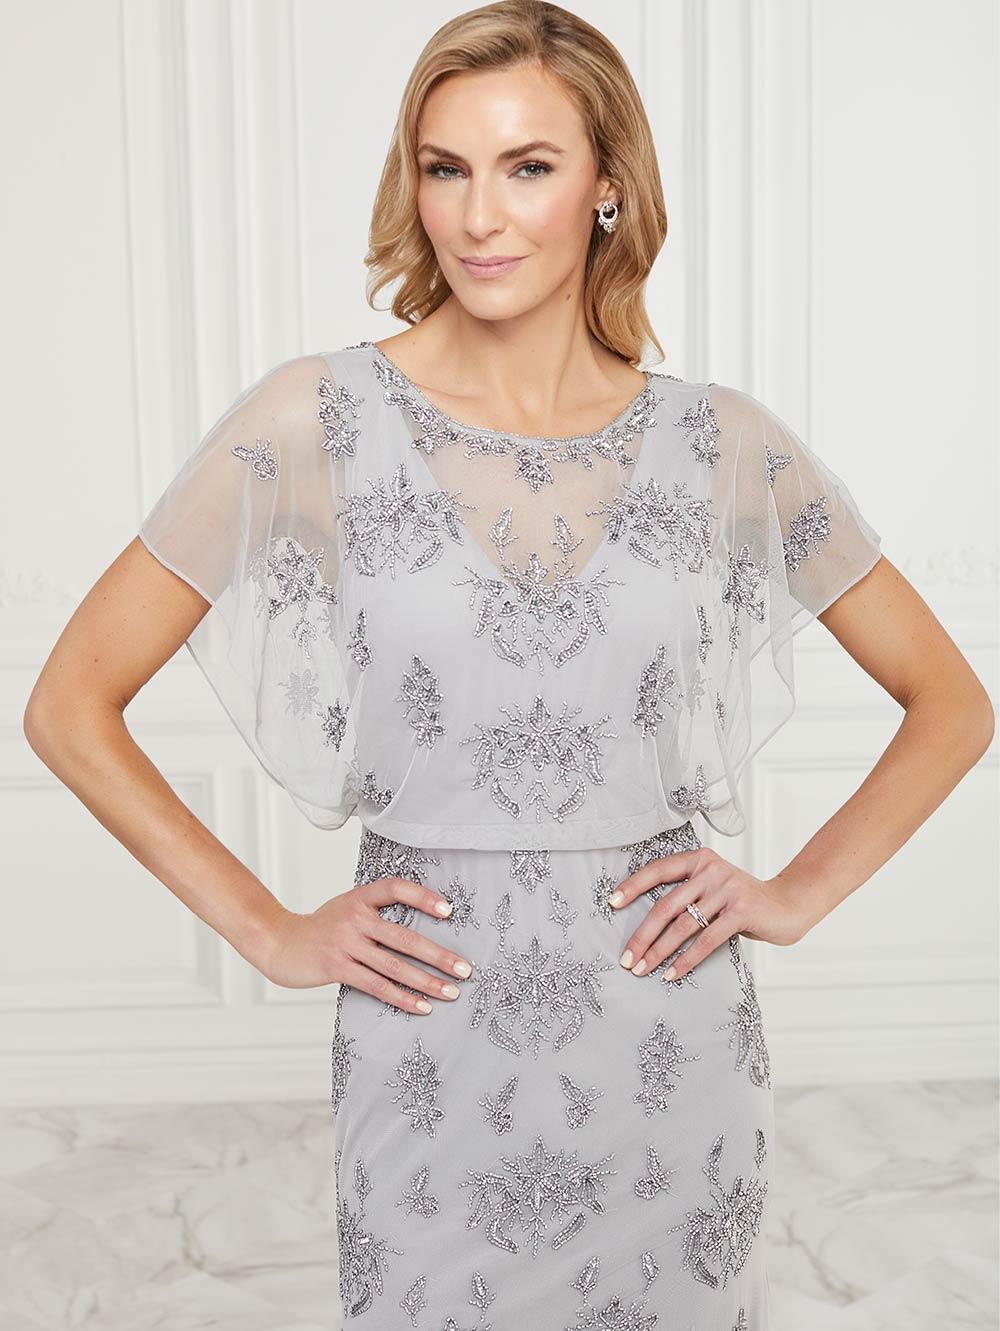 special-occasion-dresses-jacquelin-bridals-canada-27700